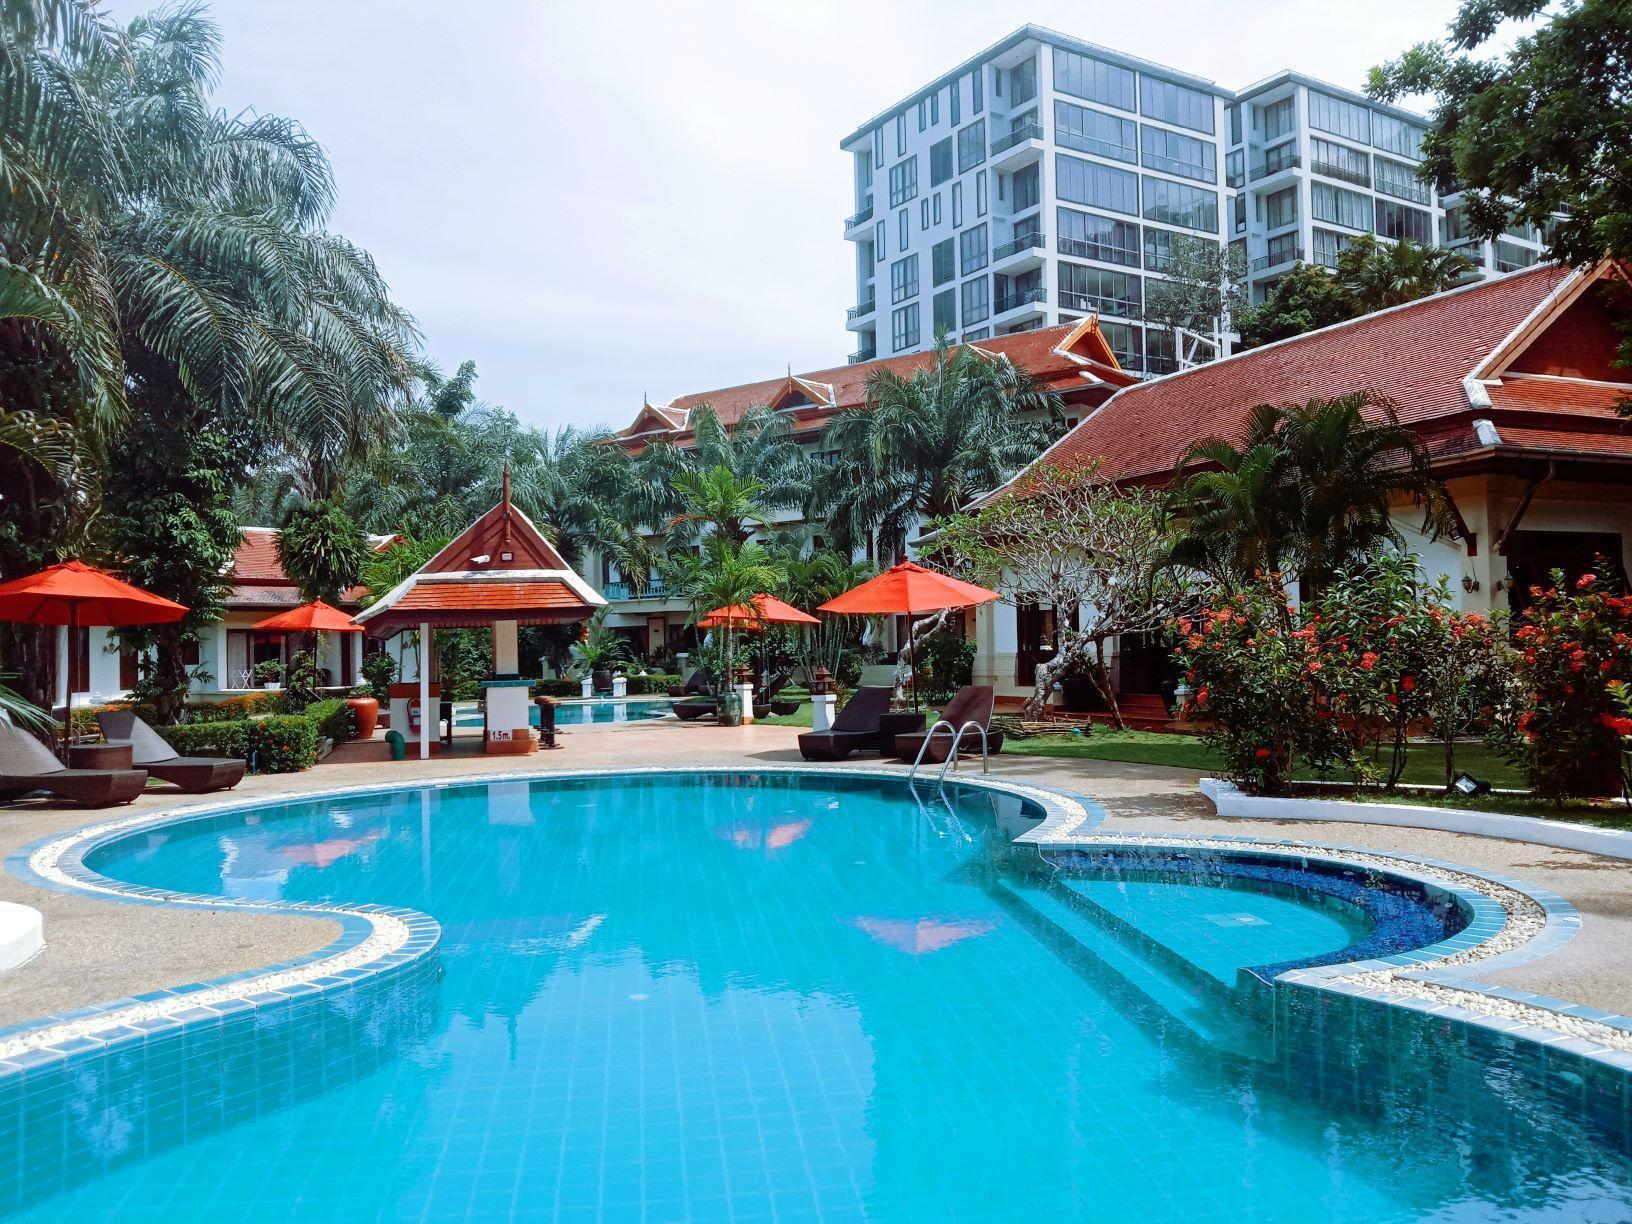 The Pe La Resort Phuket เดอะ เพ ลา รีสอร์ต ภูเก็ต